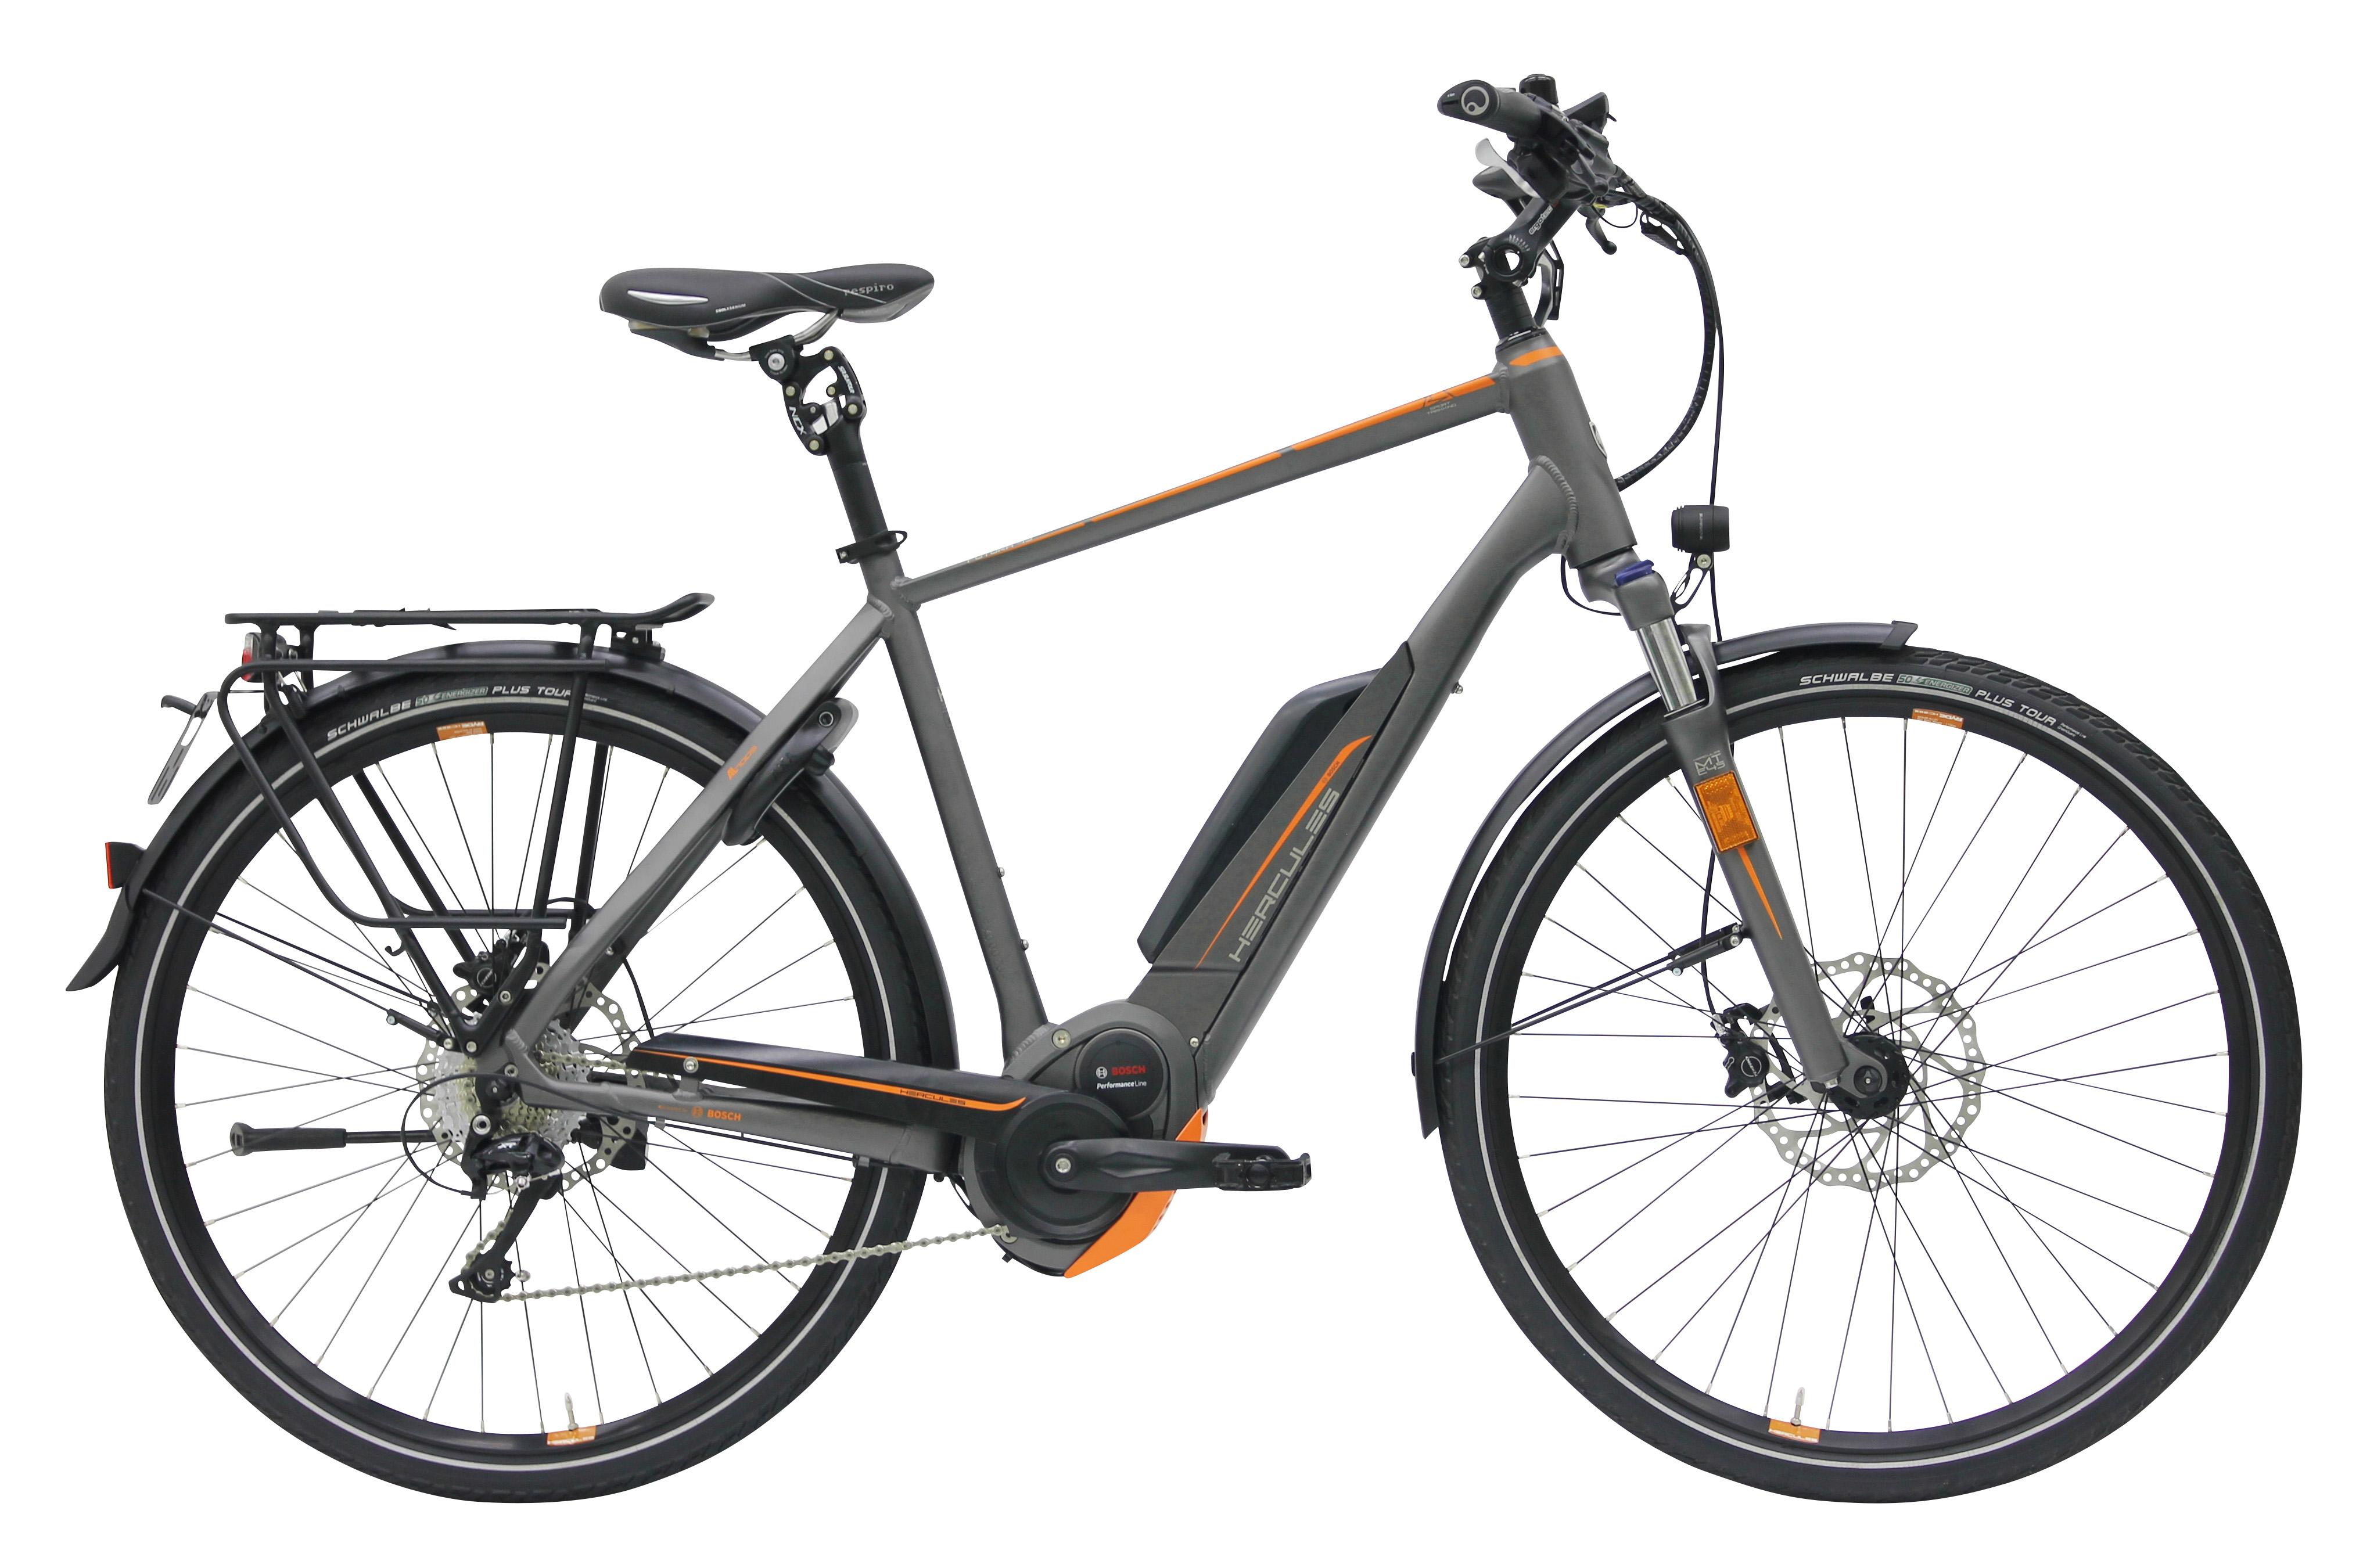 hercules futura 45 herren modell 2017 e bikes. Black Bedroom Furniture Sets. Home Design Ideas